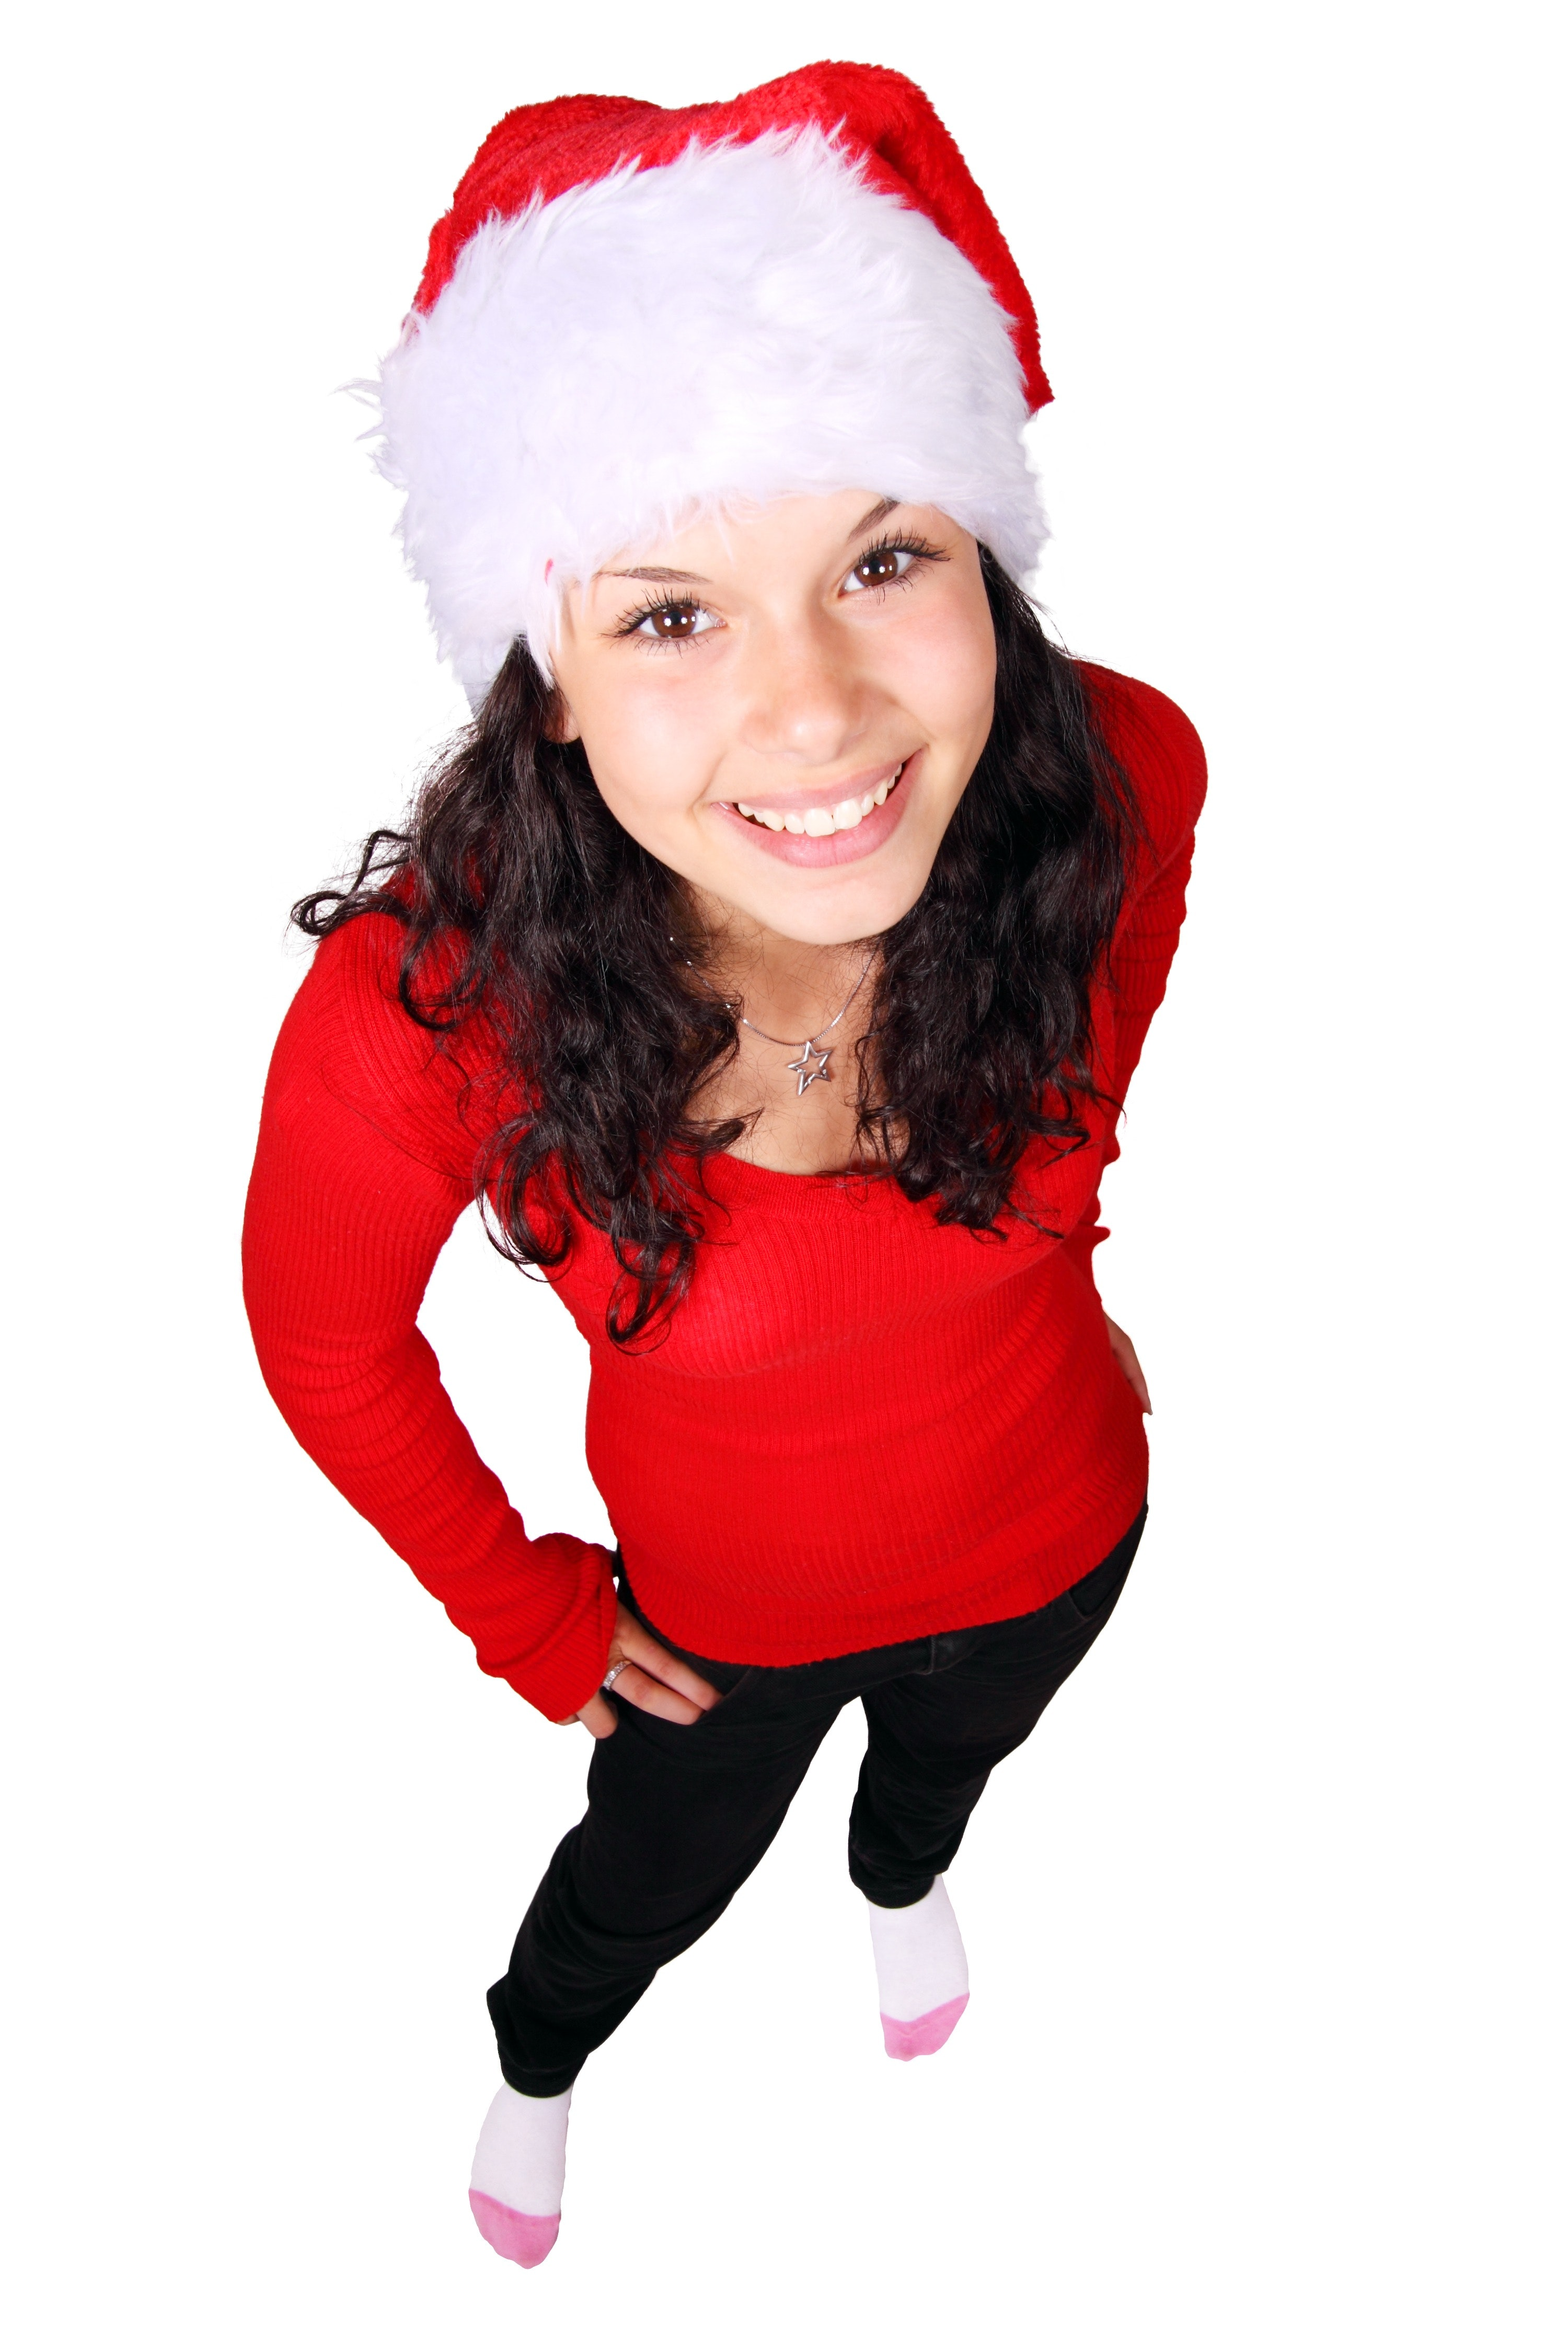 Woman in Red Long Sleeve Shirt, Christmas, Fashion, Female, Happy, HQ Photo